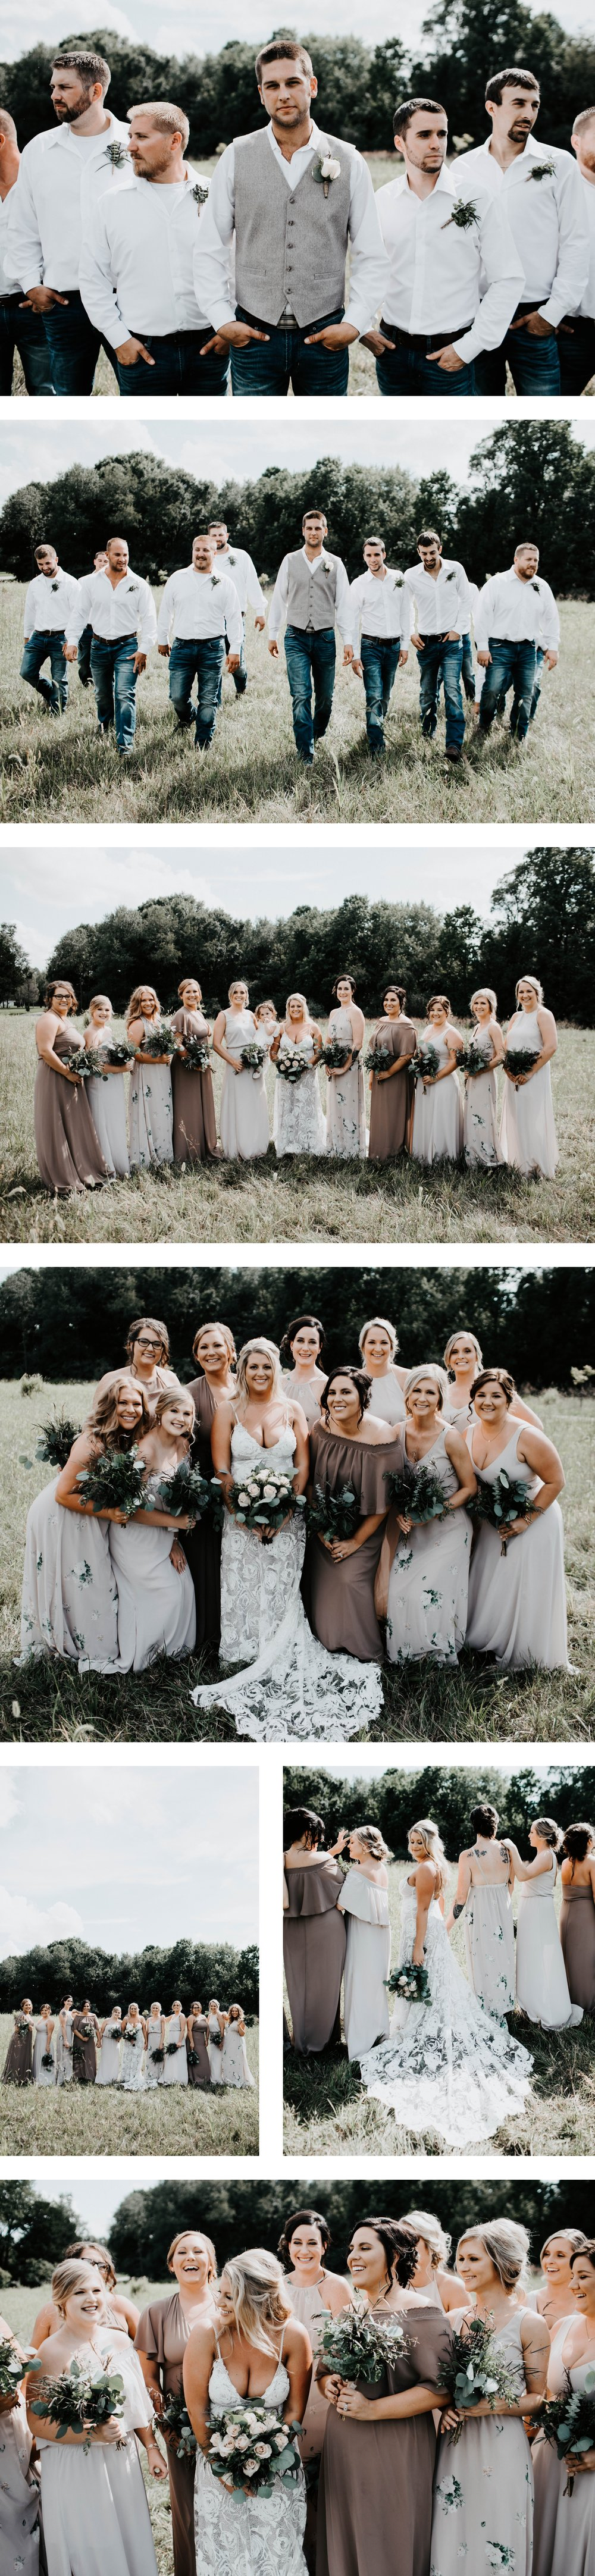 The Pudik Wedding 9.jpg